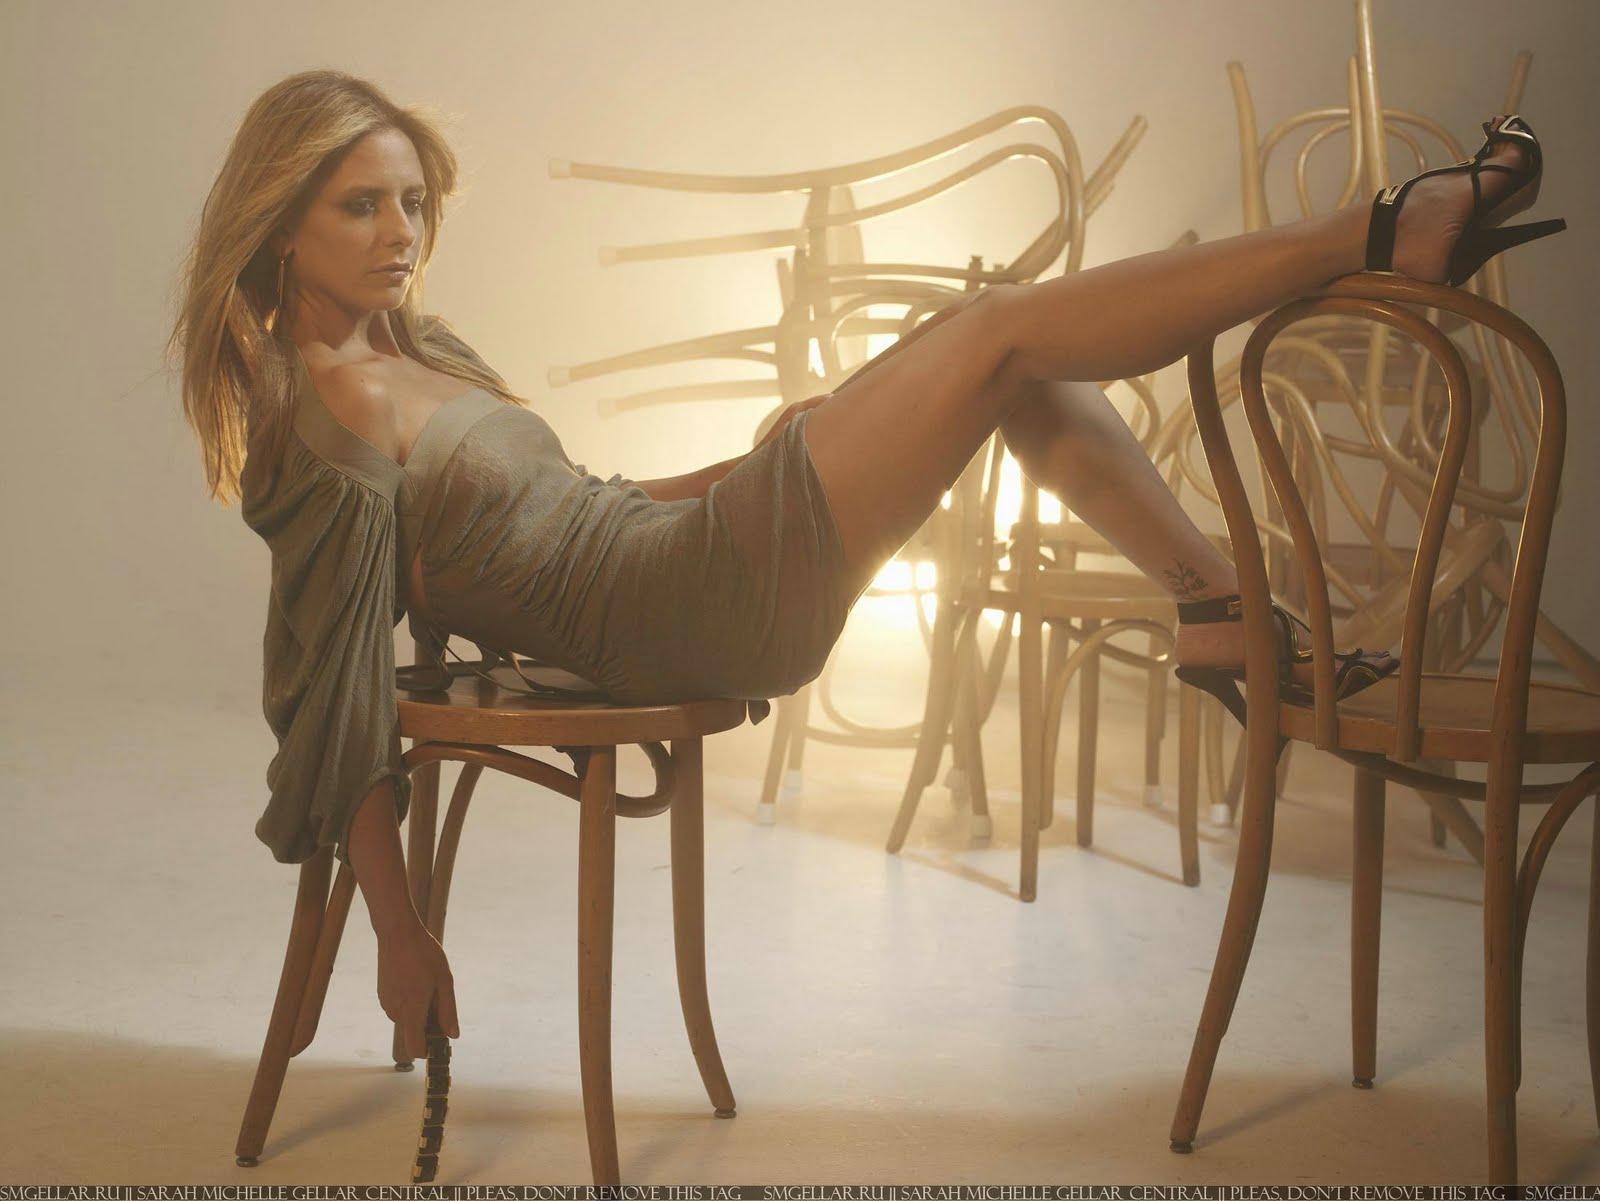 http://2.bp.blogspot.com/_nZ7RMH5N9ww/S6-SmFiknII/AAAAAAAAAoQ/BjEIjx0TxrY/s1600/sarah-Michelle-Gellar-sarah-michelle-gellar4.jpg